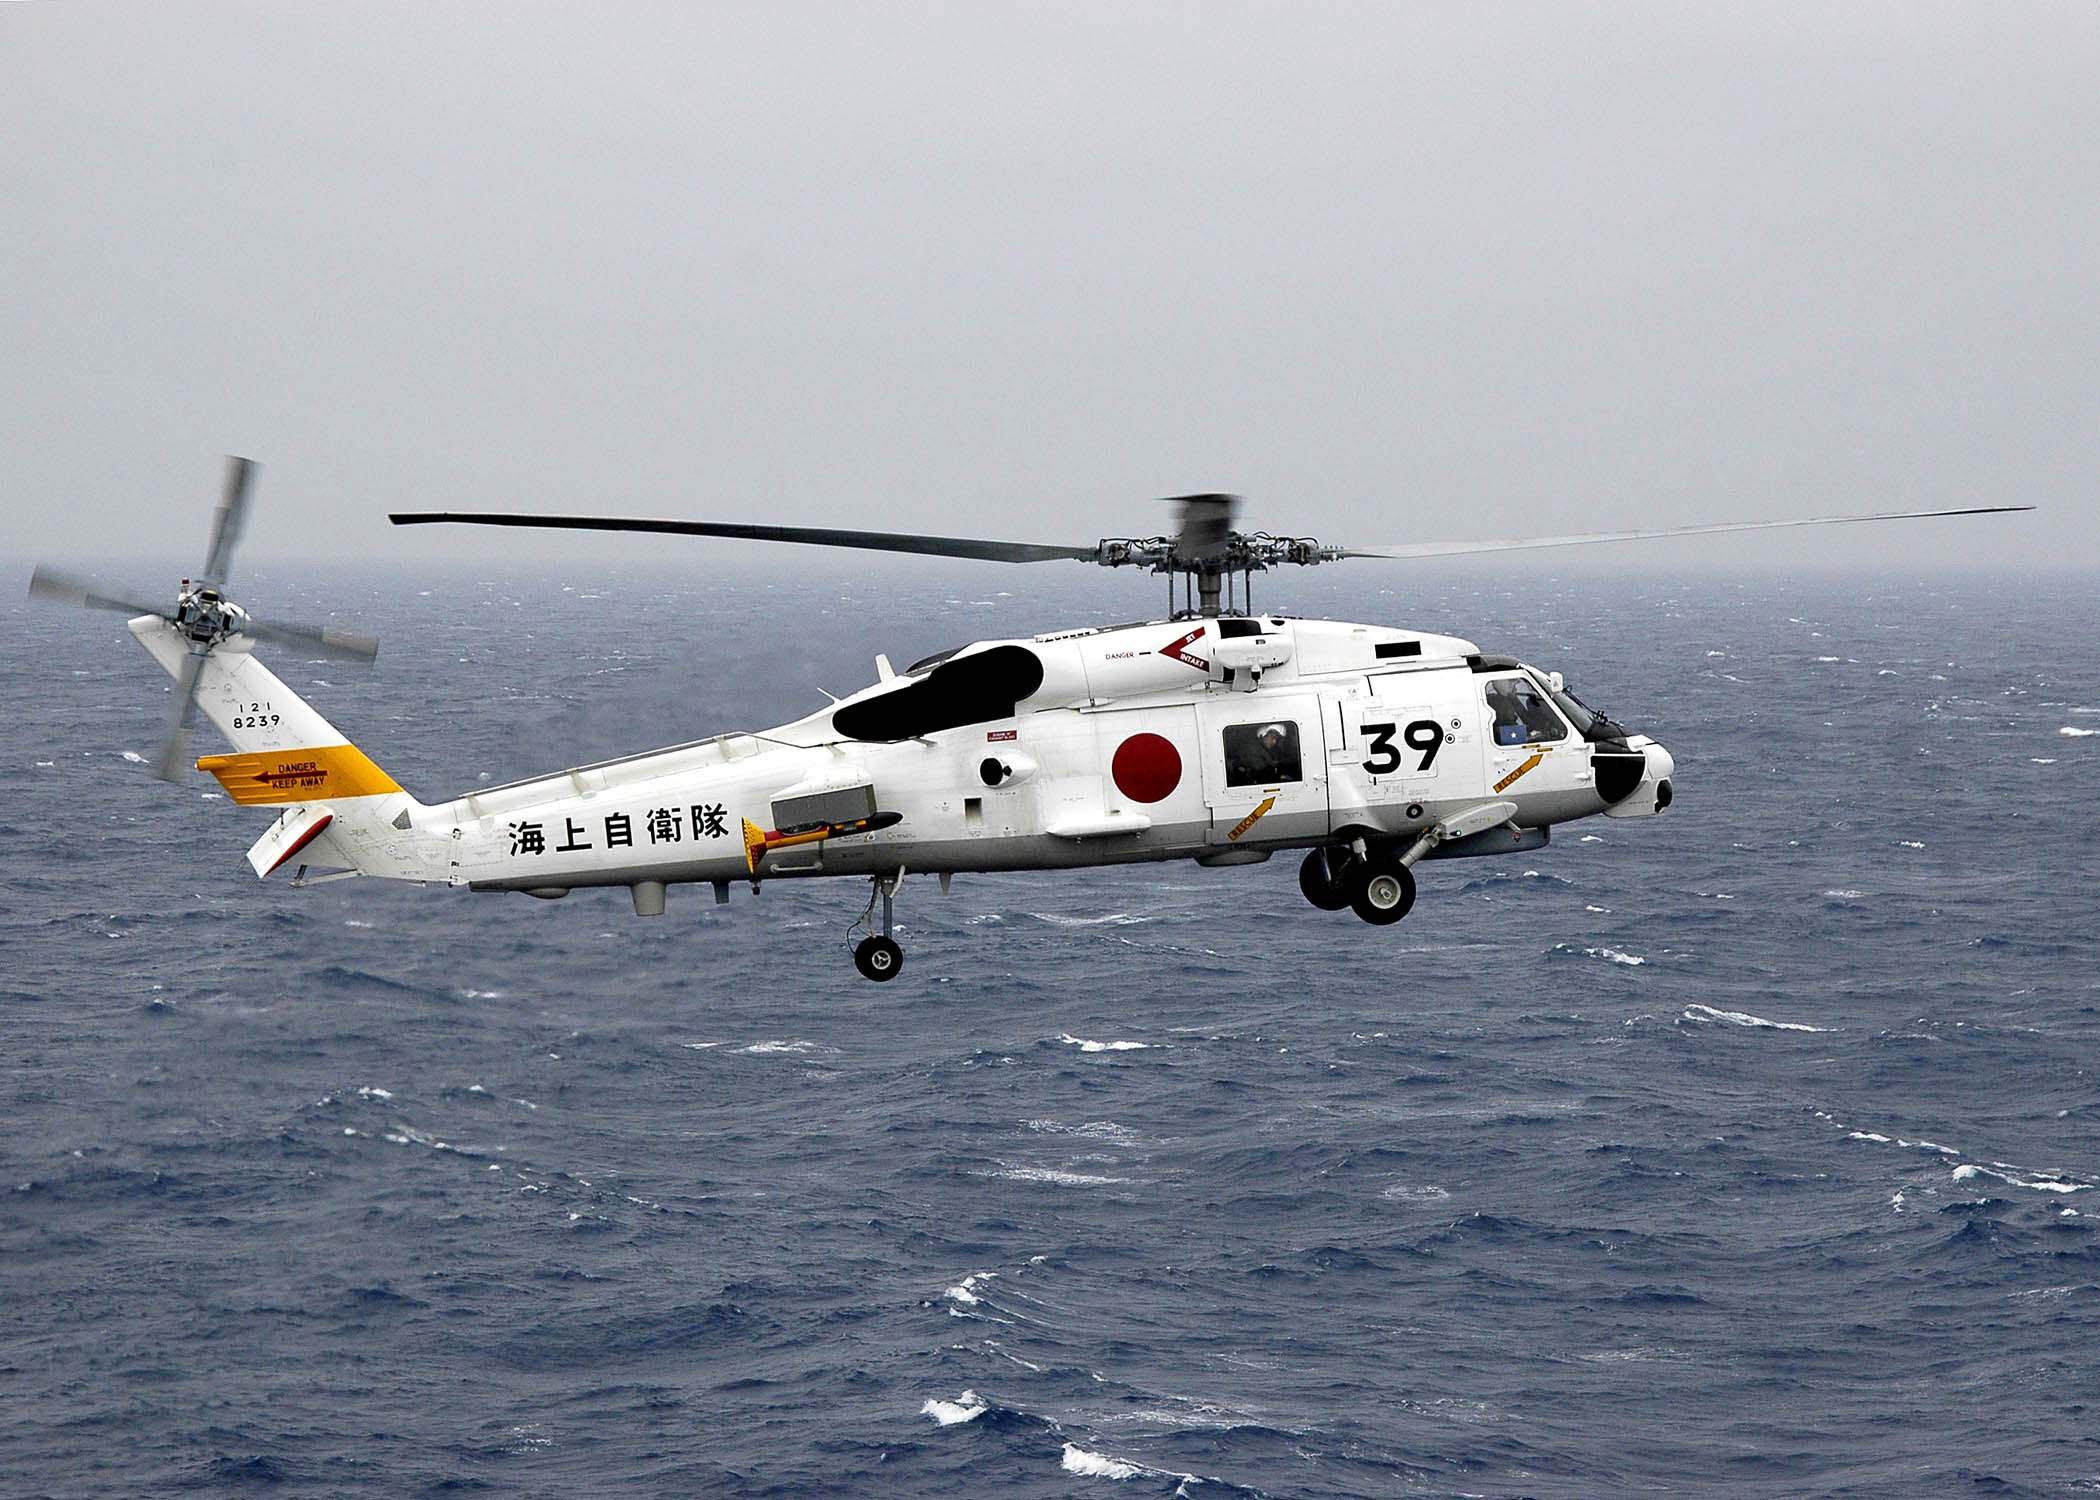 US_Navy_060322-N-7981E-015_A_Japan_Maritime_Self_Defense_Force_SH-60J_helicopter_carrying_Commander_Destroyer_Squadron_Nine_(CDS-9),_Capt.jpg